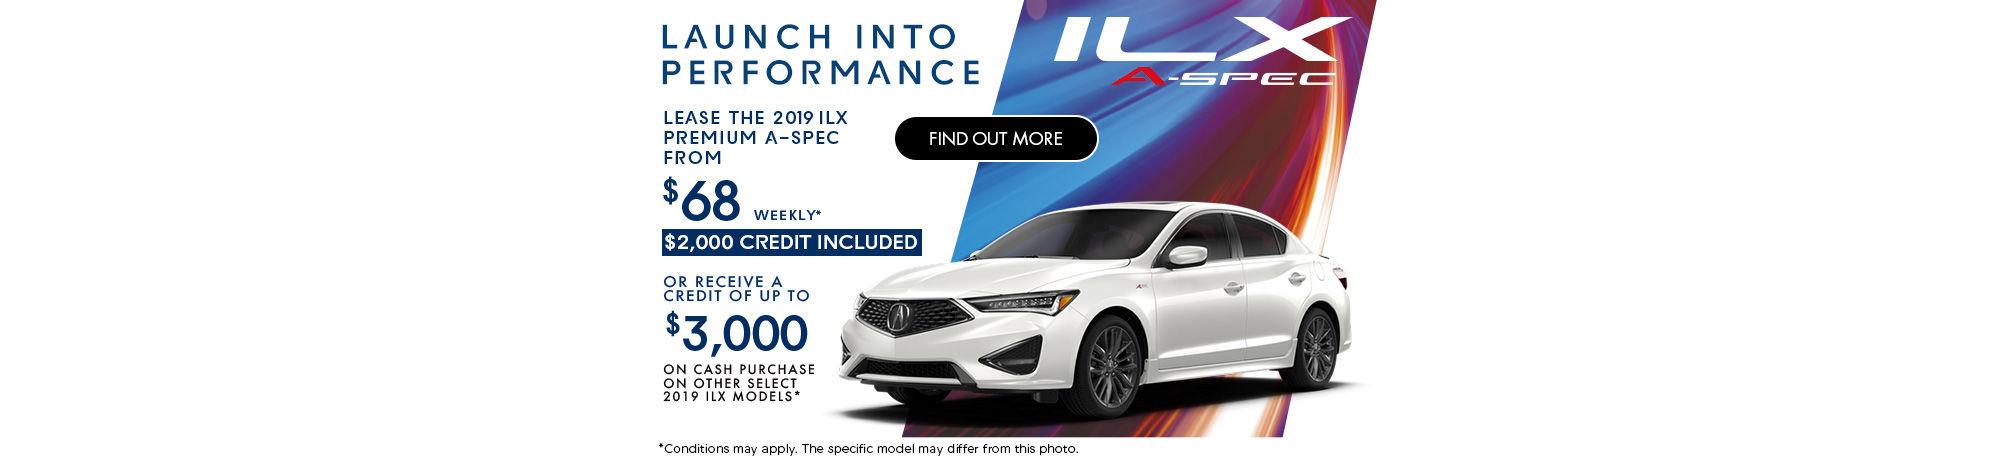 The new 2019 Acura ILX